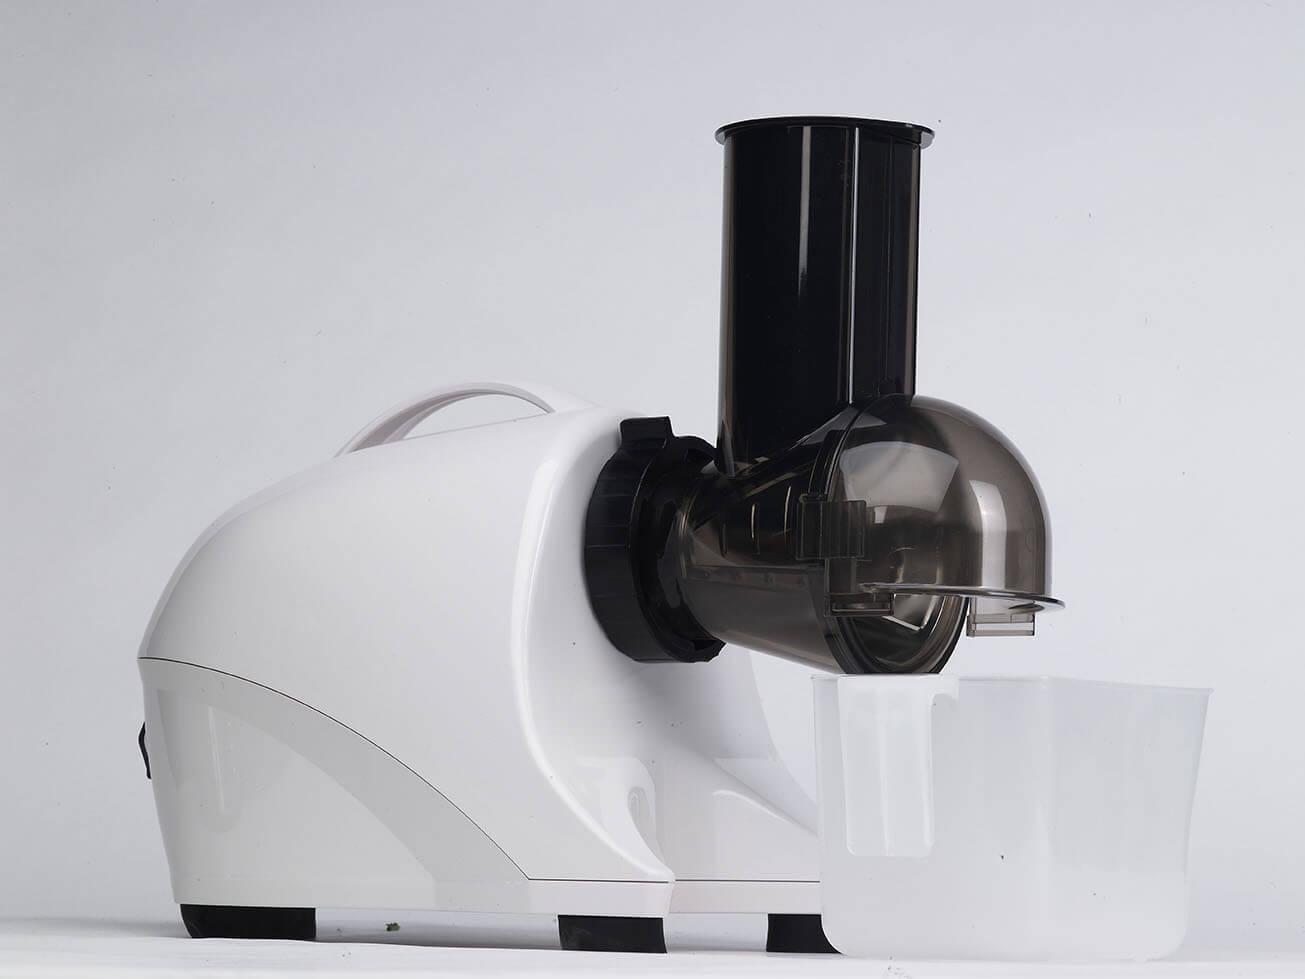 Tribest-Solostar-4-Blanc-Extracteur-De-Jus-Horizontal